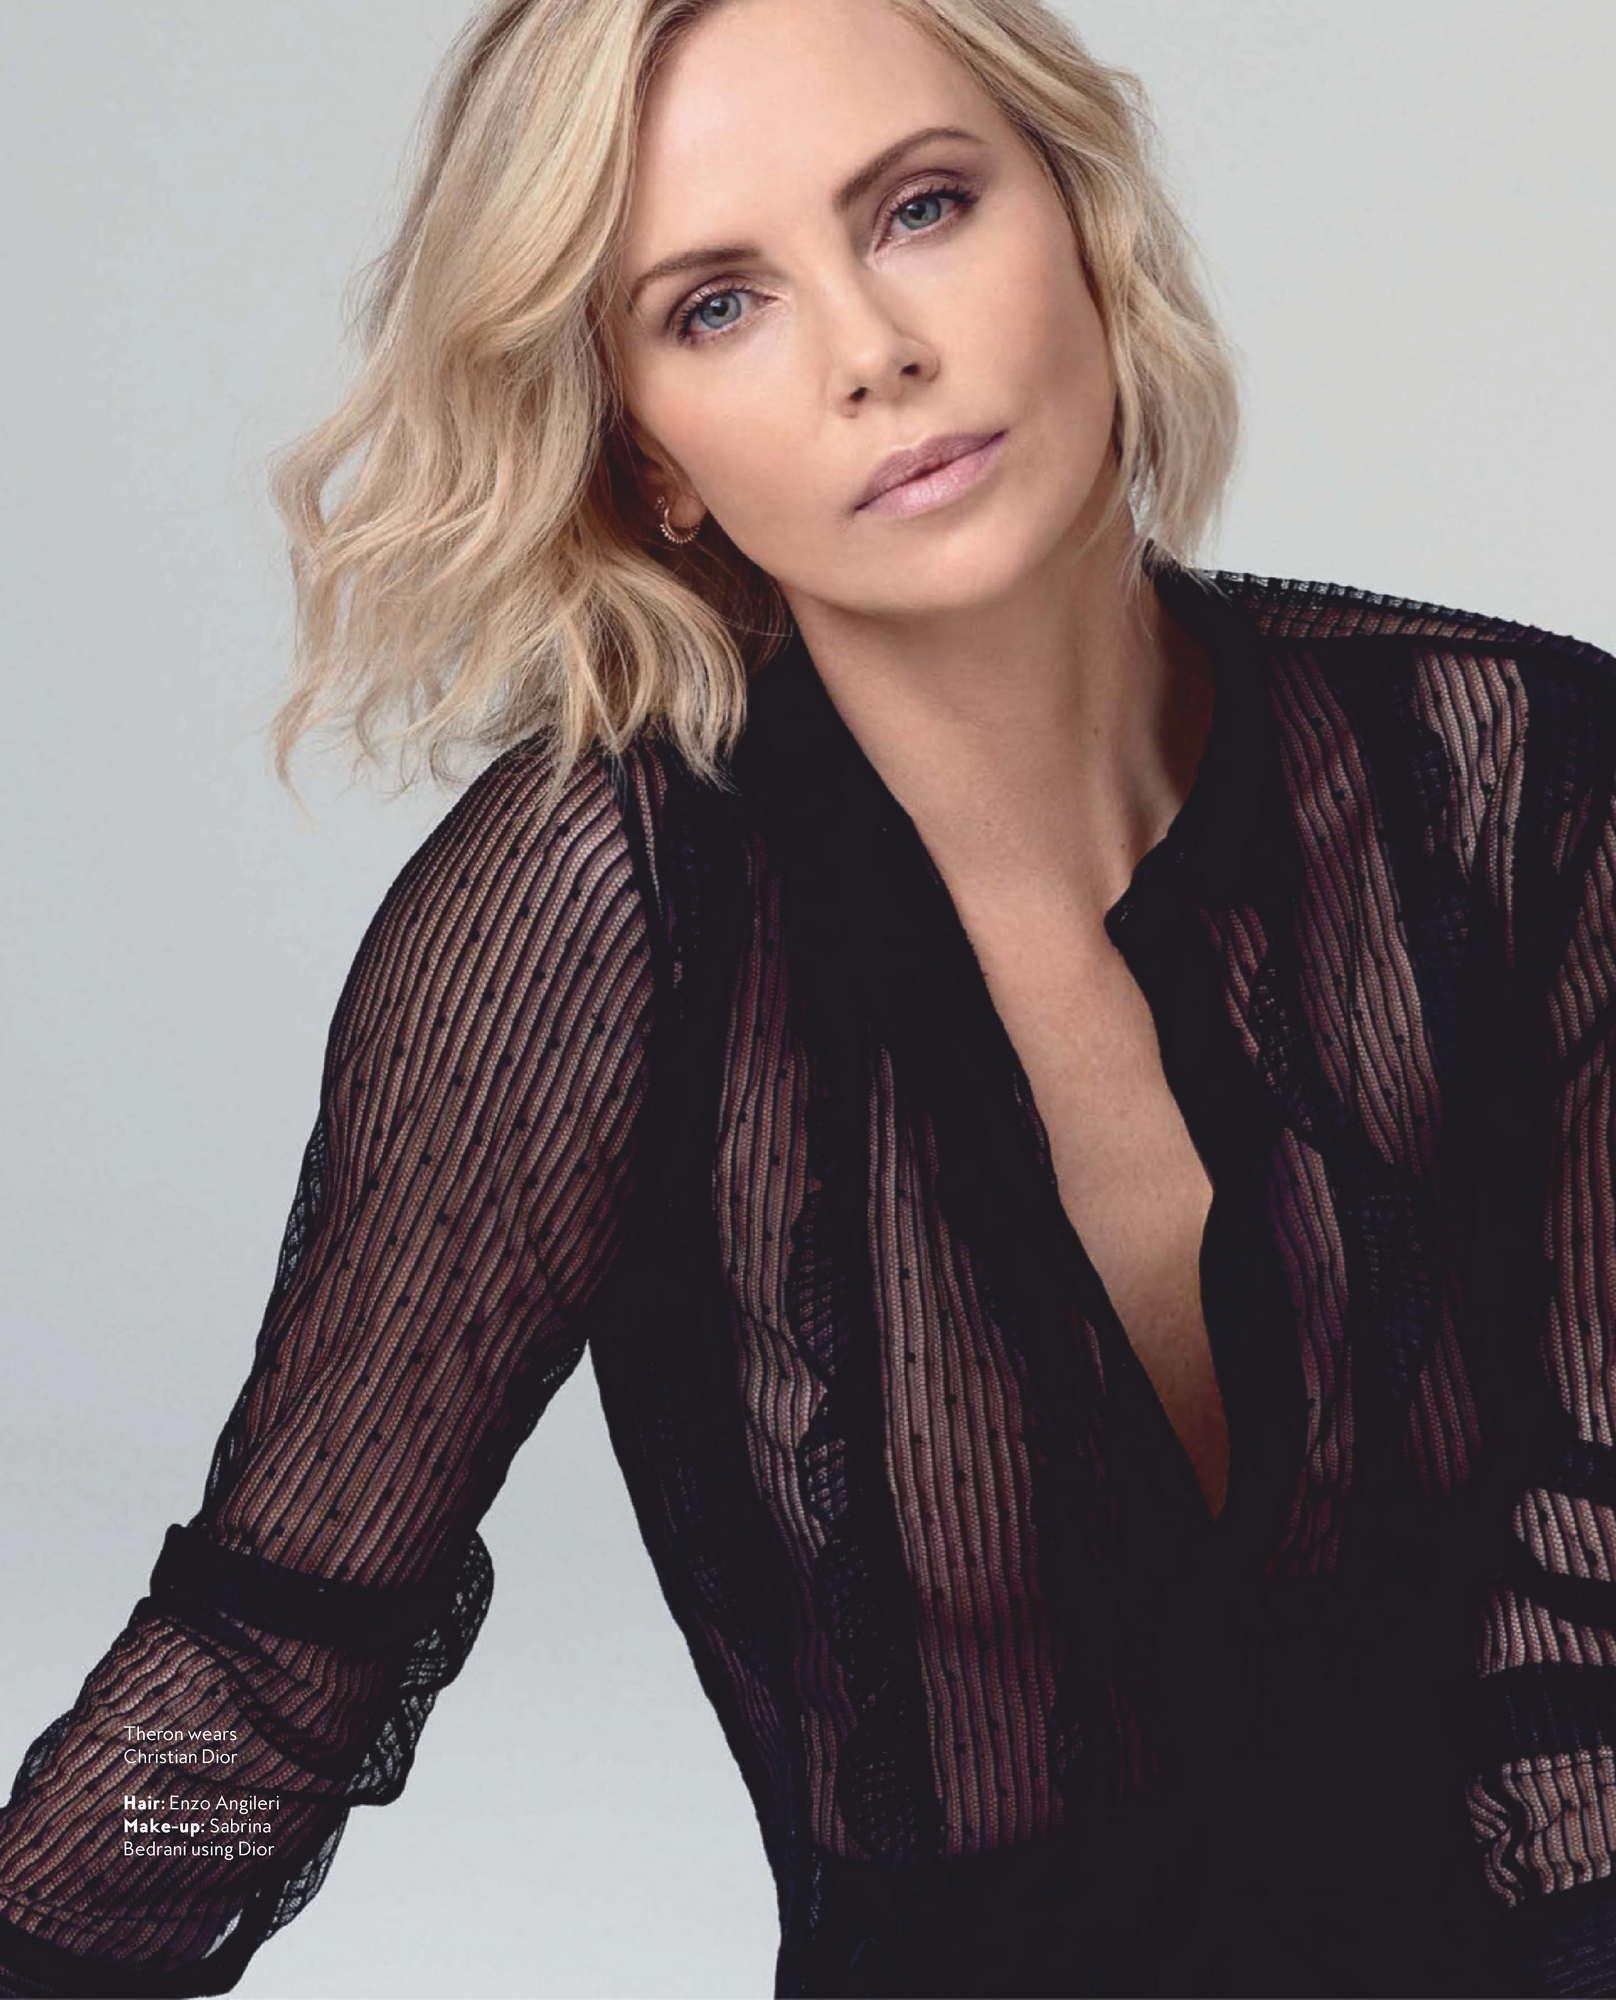 Charlize-Theron-InStyle-Australia-January-20195.jpg